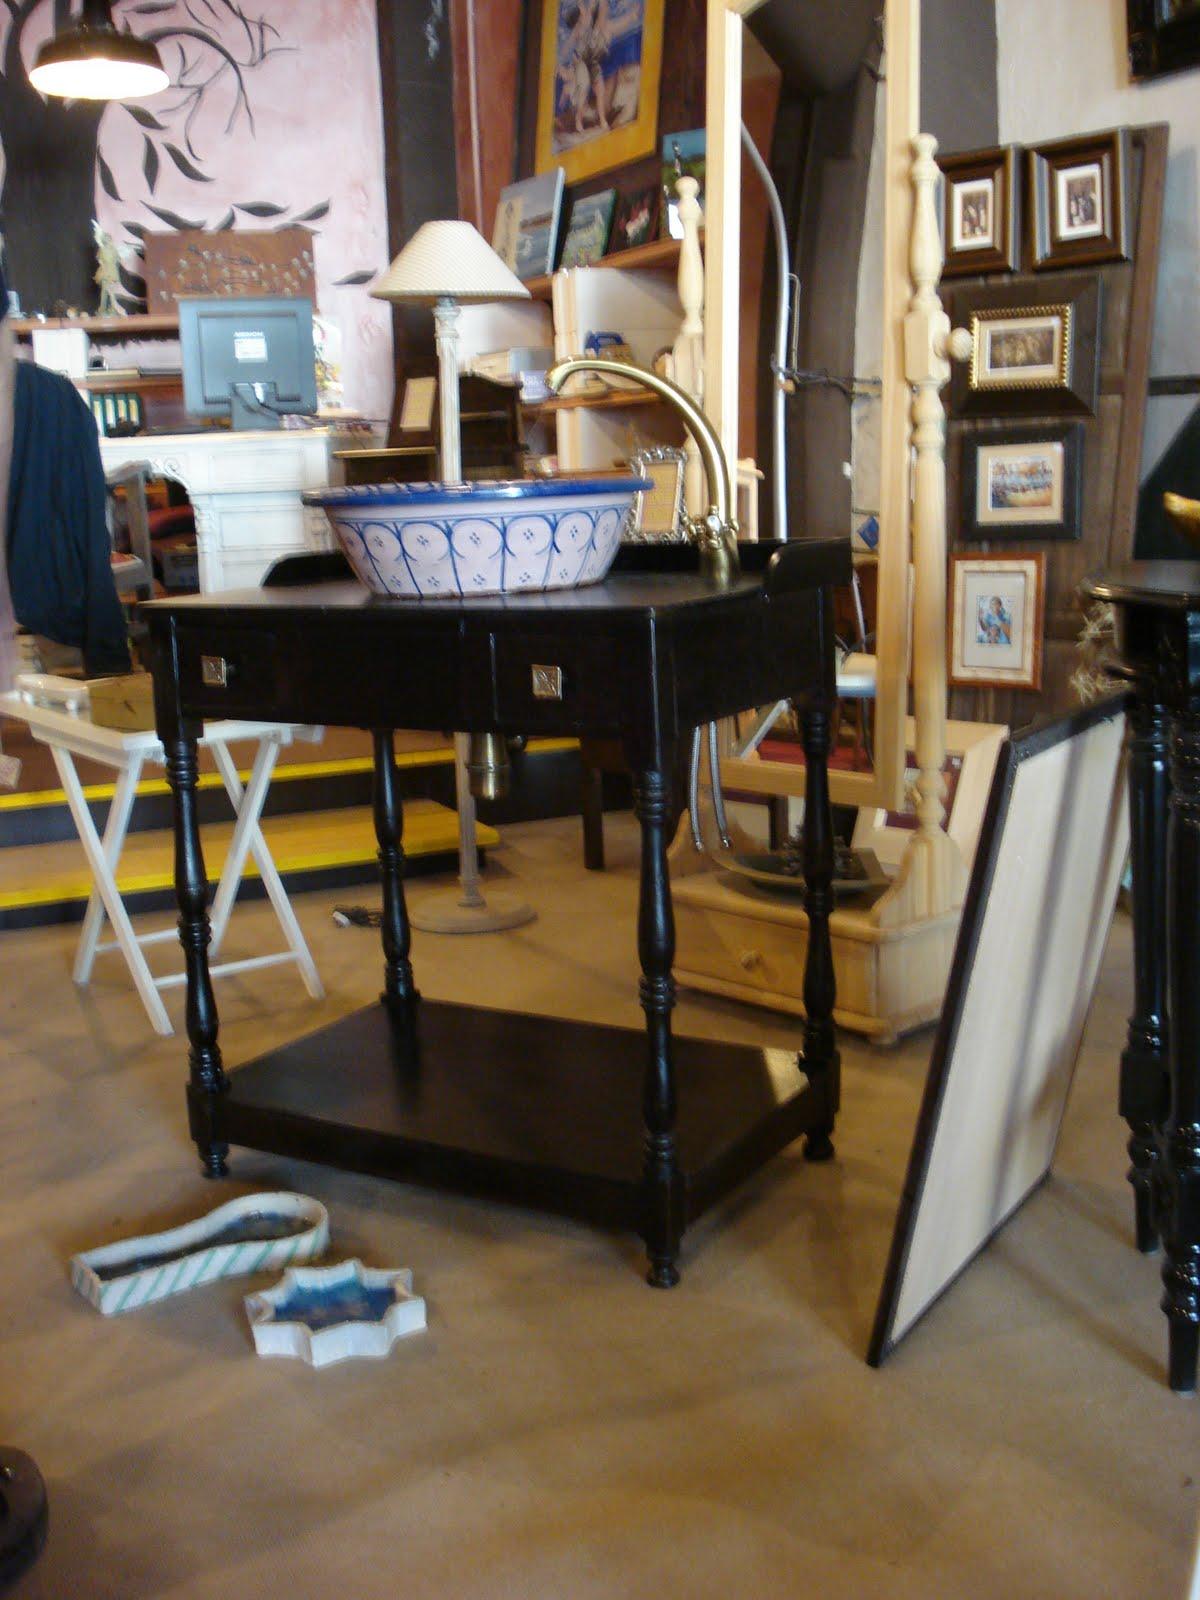 Hechoamano mueble de ba o antiguo restaurado - Mueble de bano antiguo ...